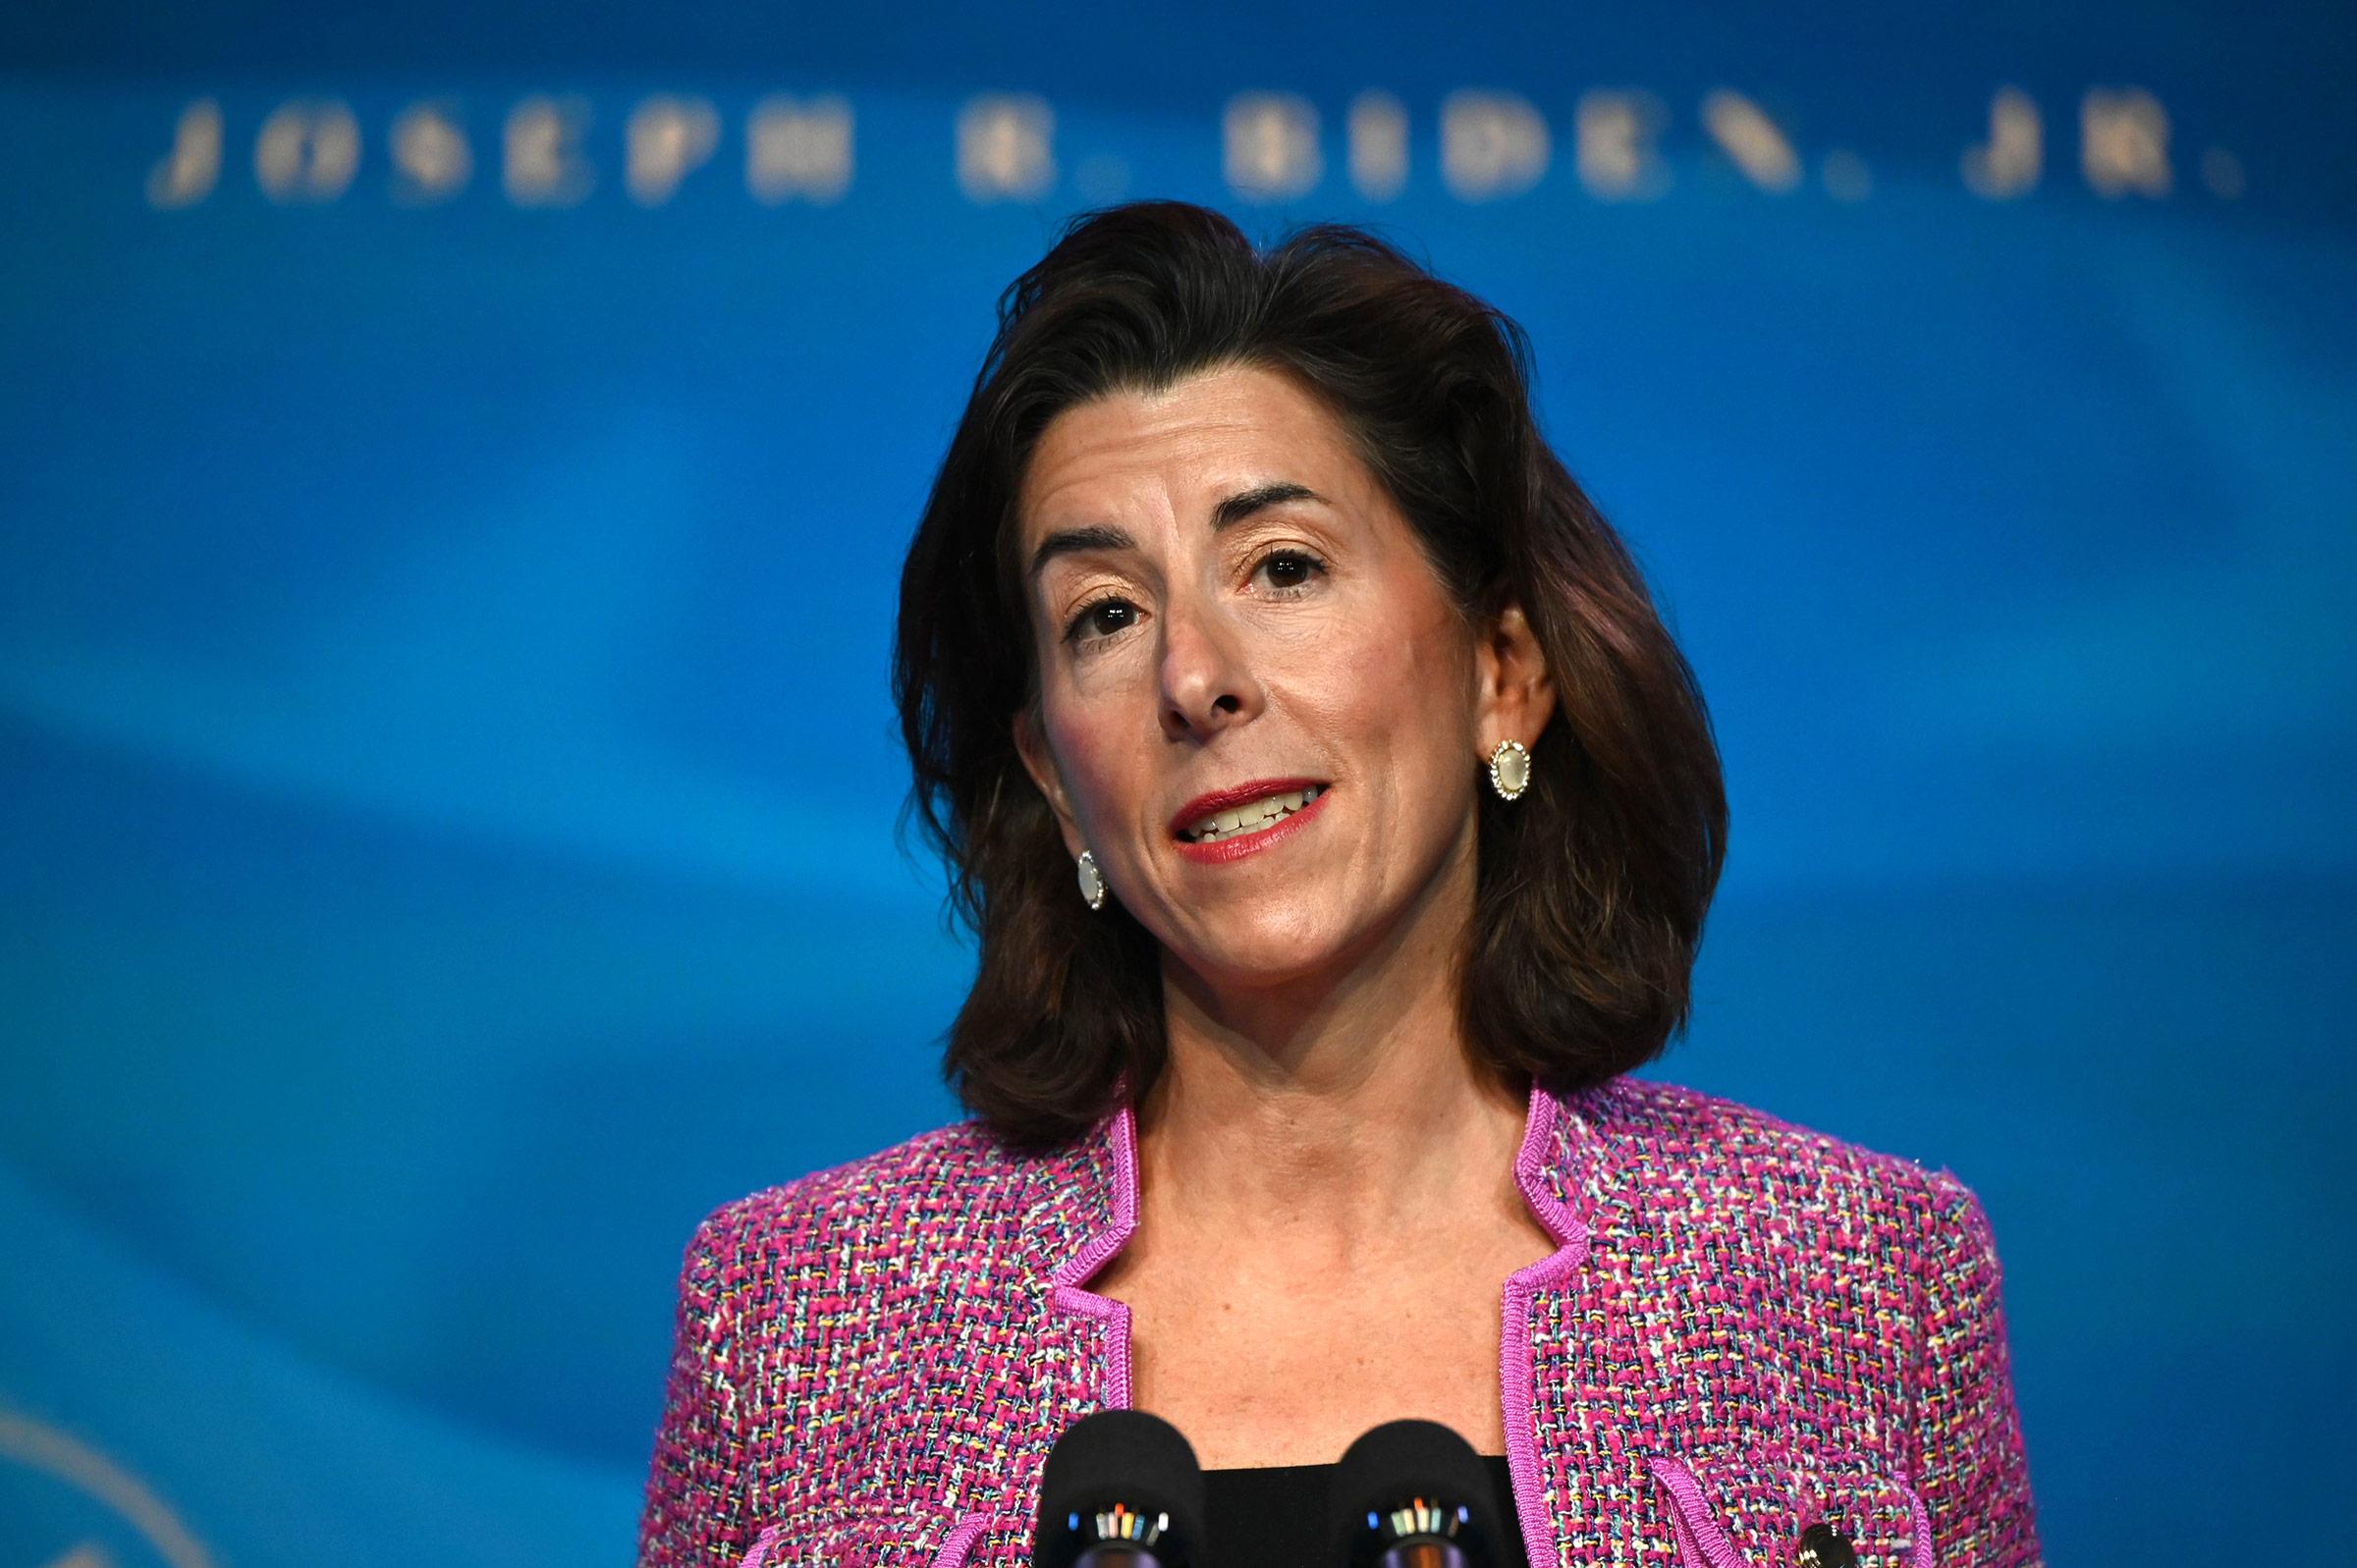 Gina Raimondo speaks at The Queen theater January 8 in Wilmington, Delaware.